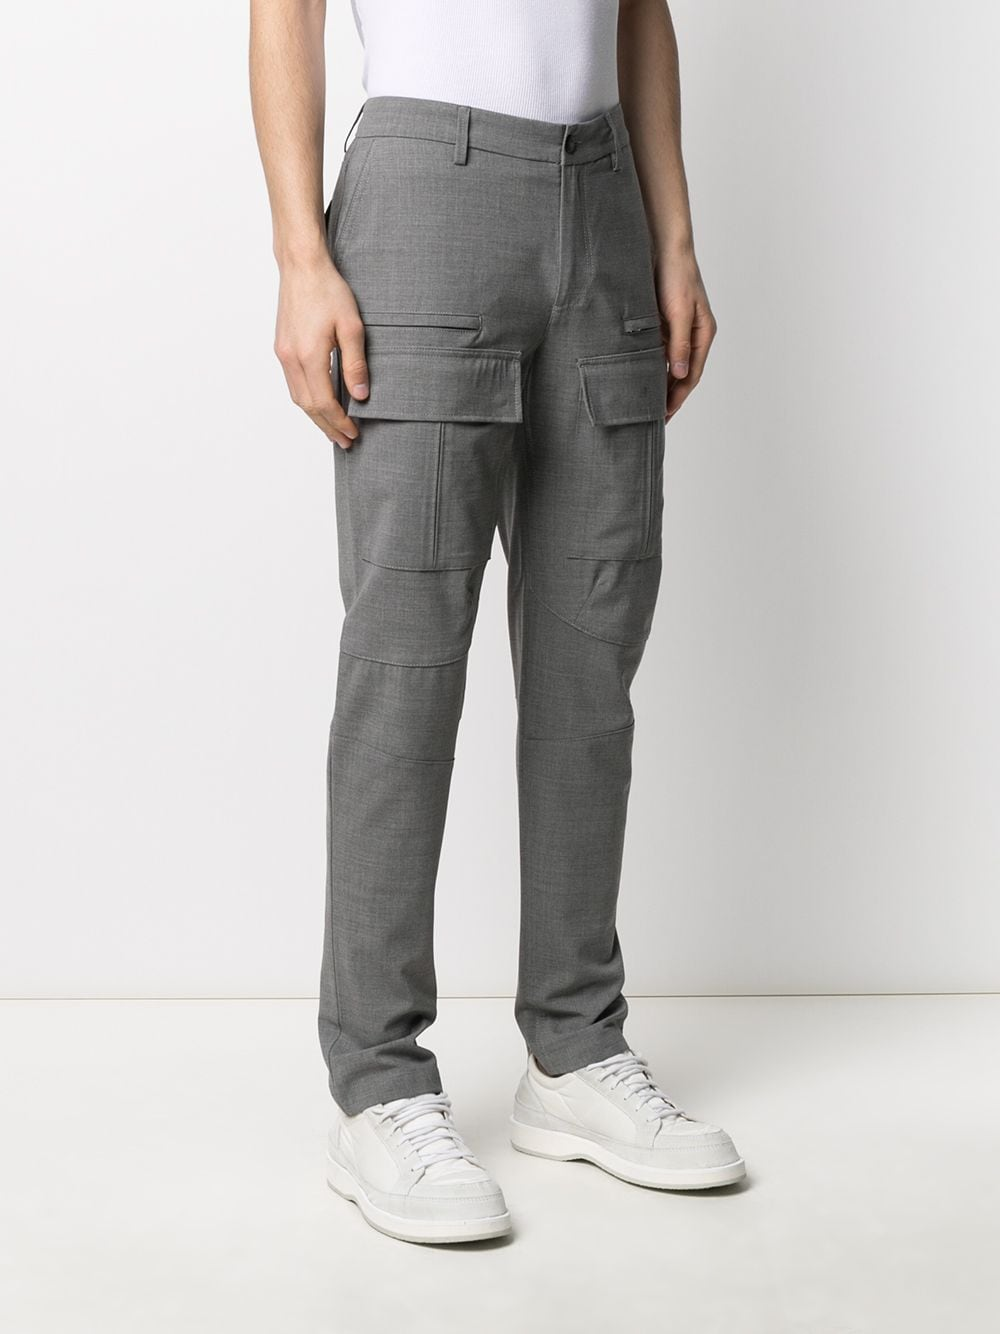 Pantaloni in misto lana grigia ELEVENTY | Pantaloni | C75PANB03-TES0A05313